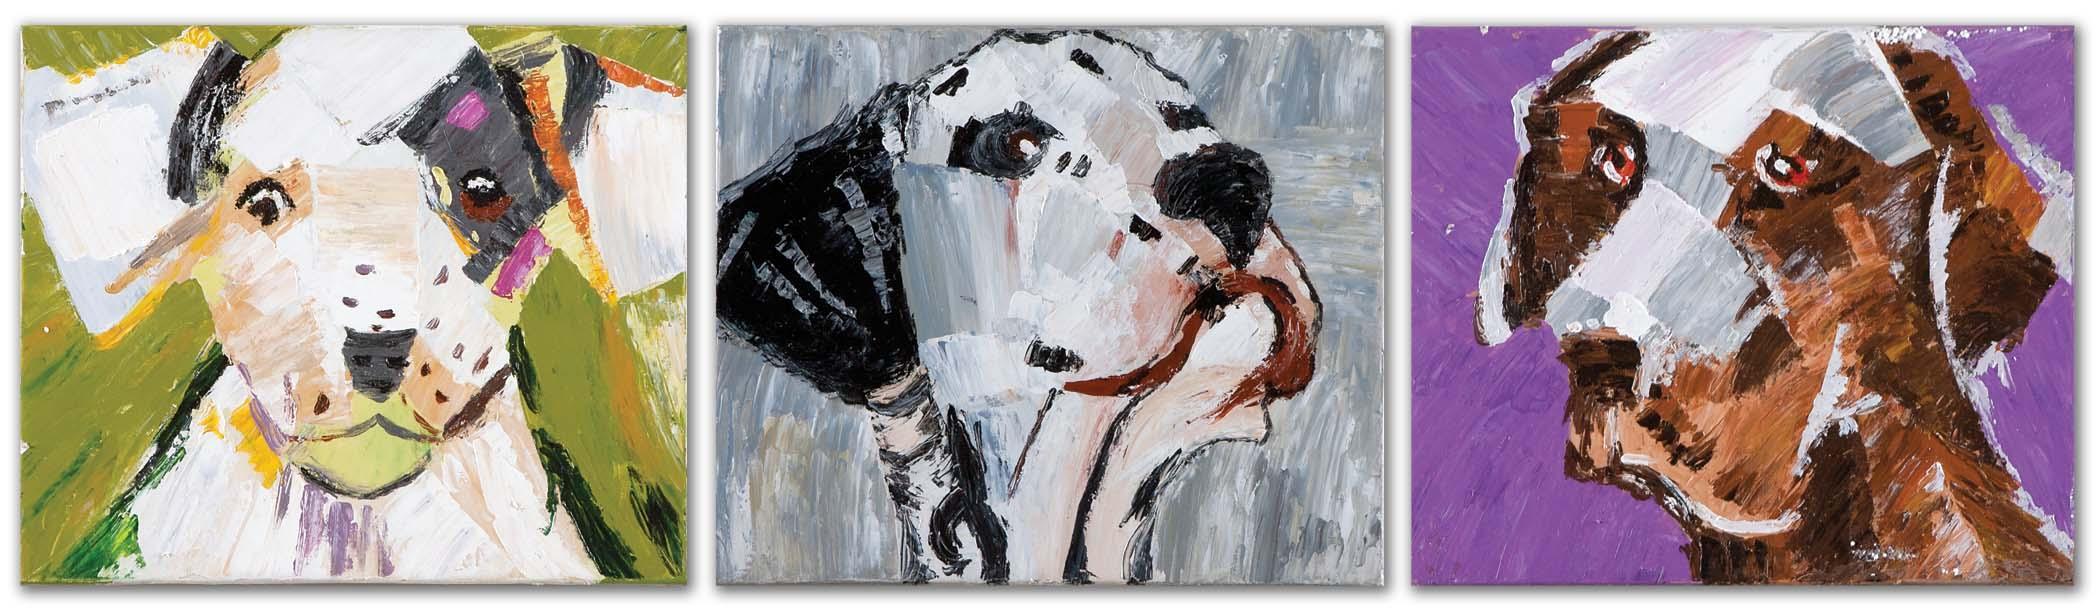 Uttermost Art Three Amigos Canvas Art - Item Number: 41902